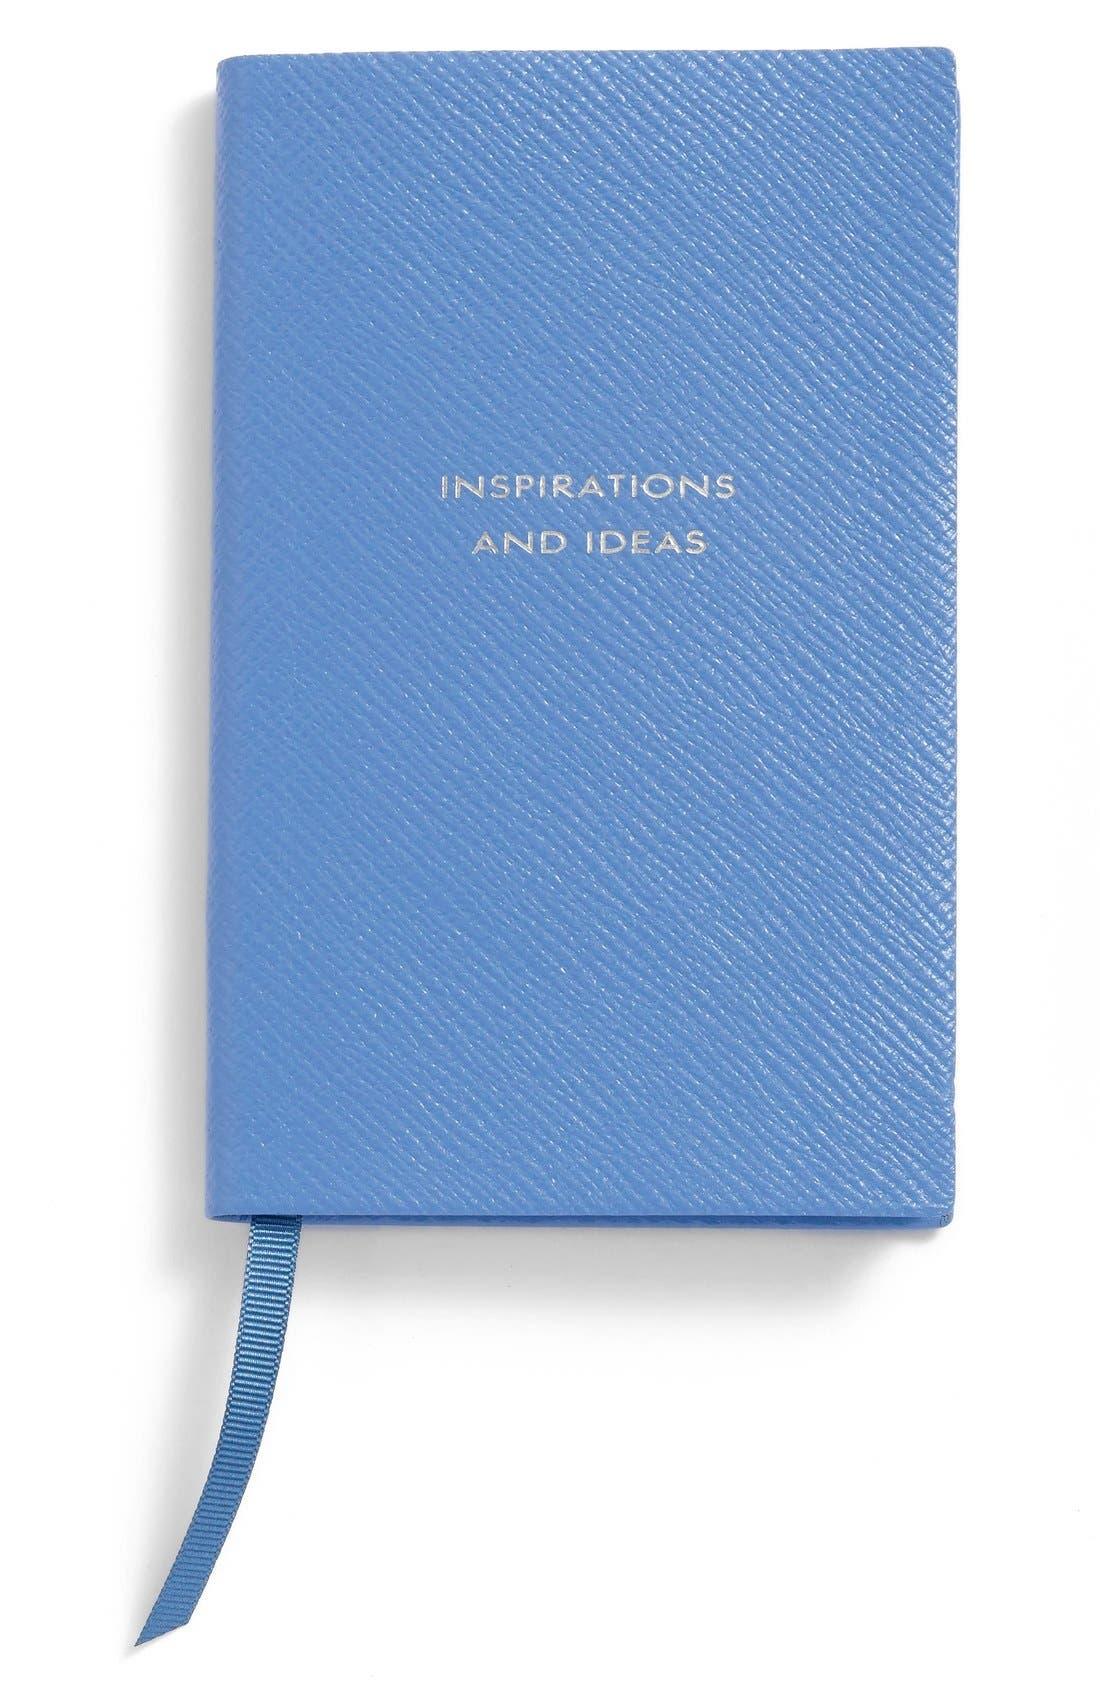 'Inspirations and Ideas - Panama' Pocket Notebook,                             Main thumbnail 1, color,                             BLUE NILE HERITAGE